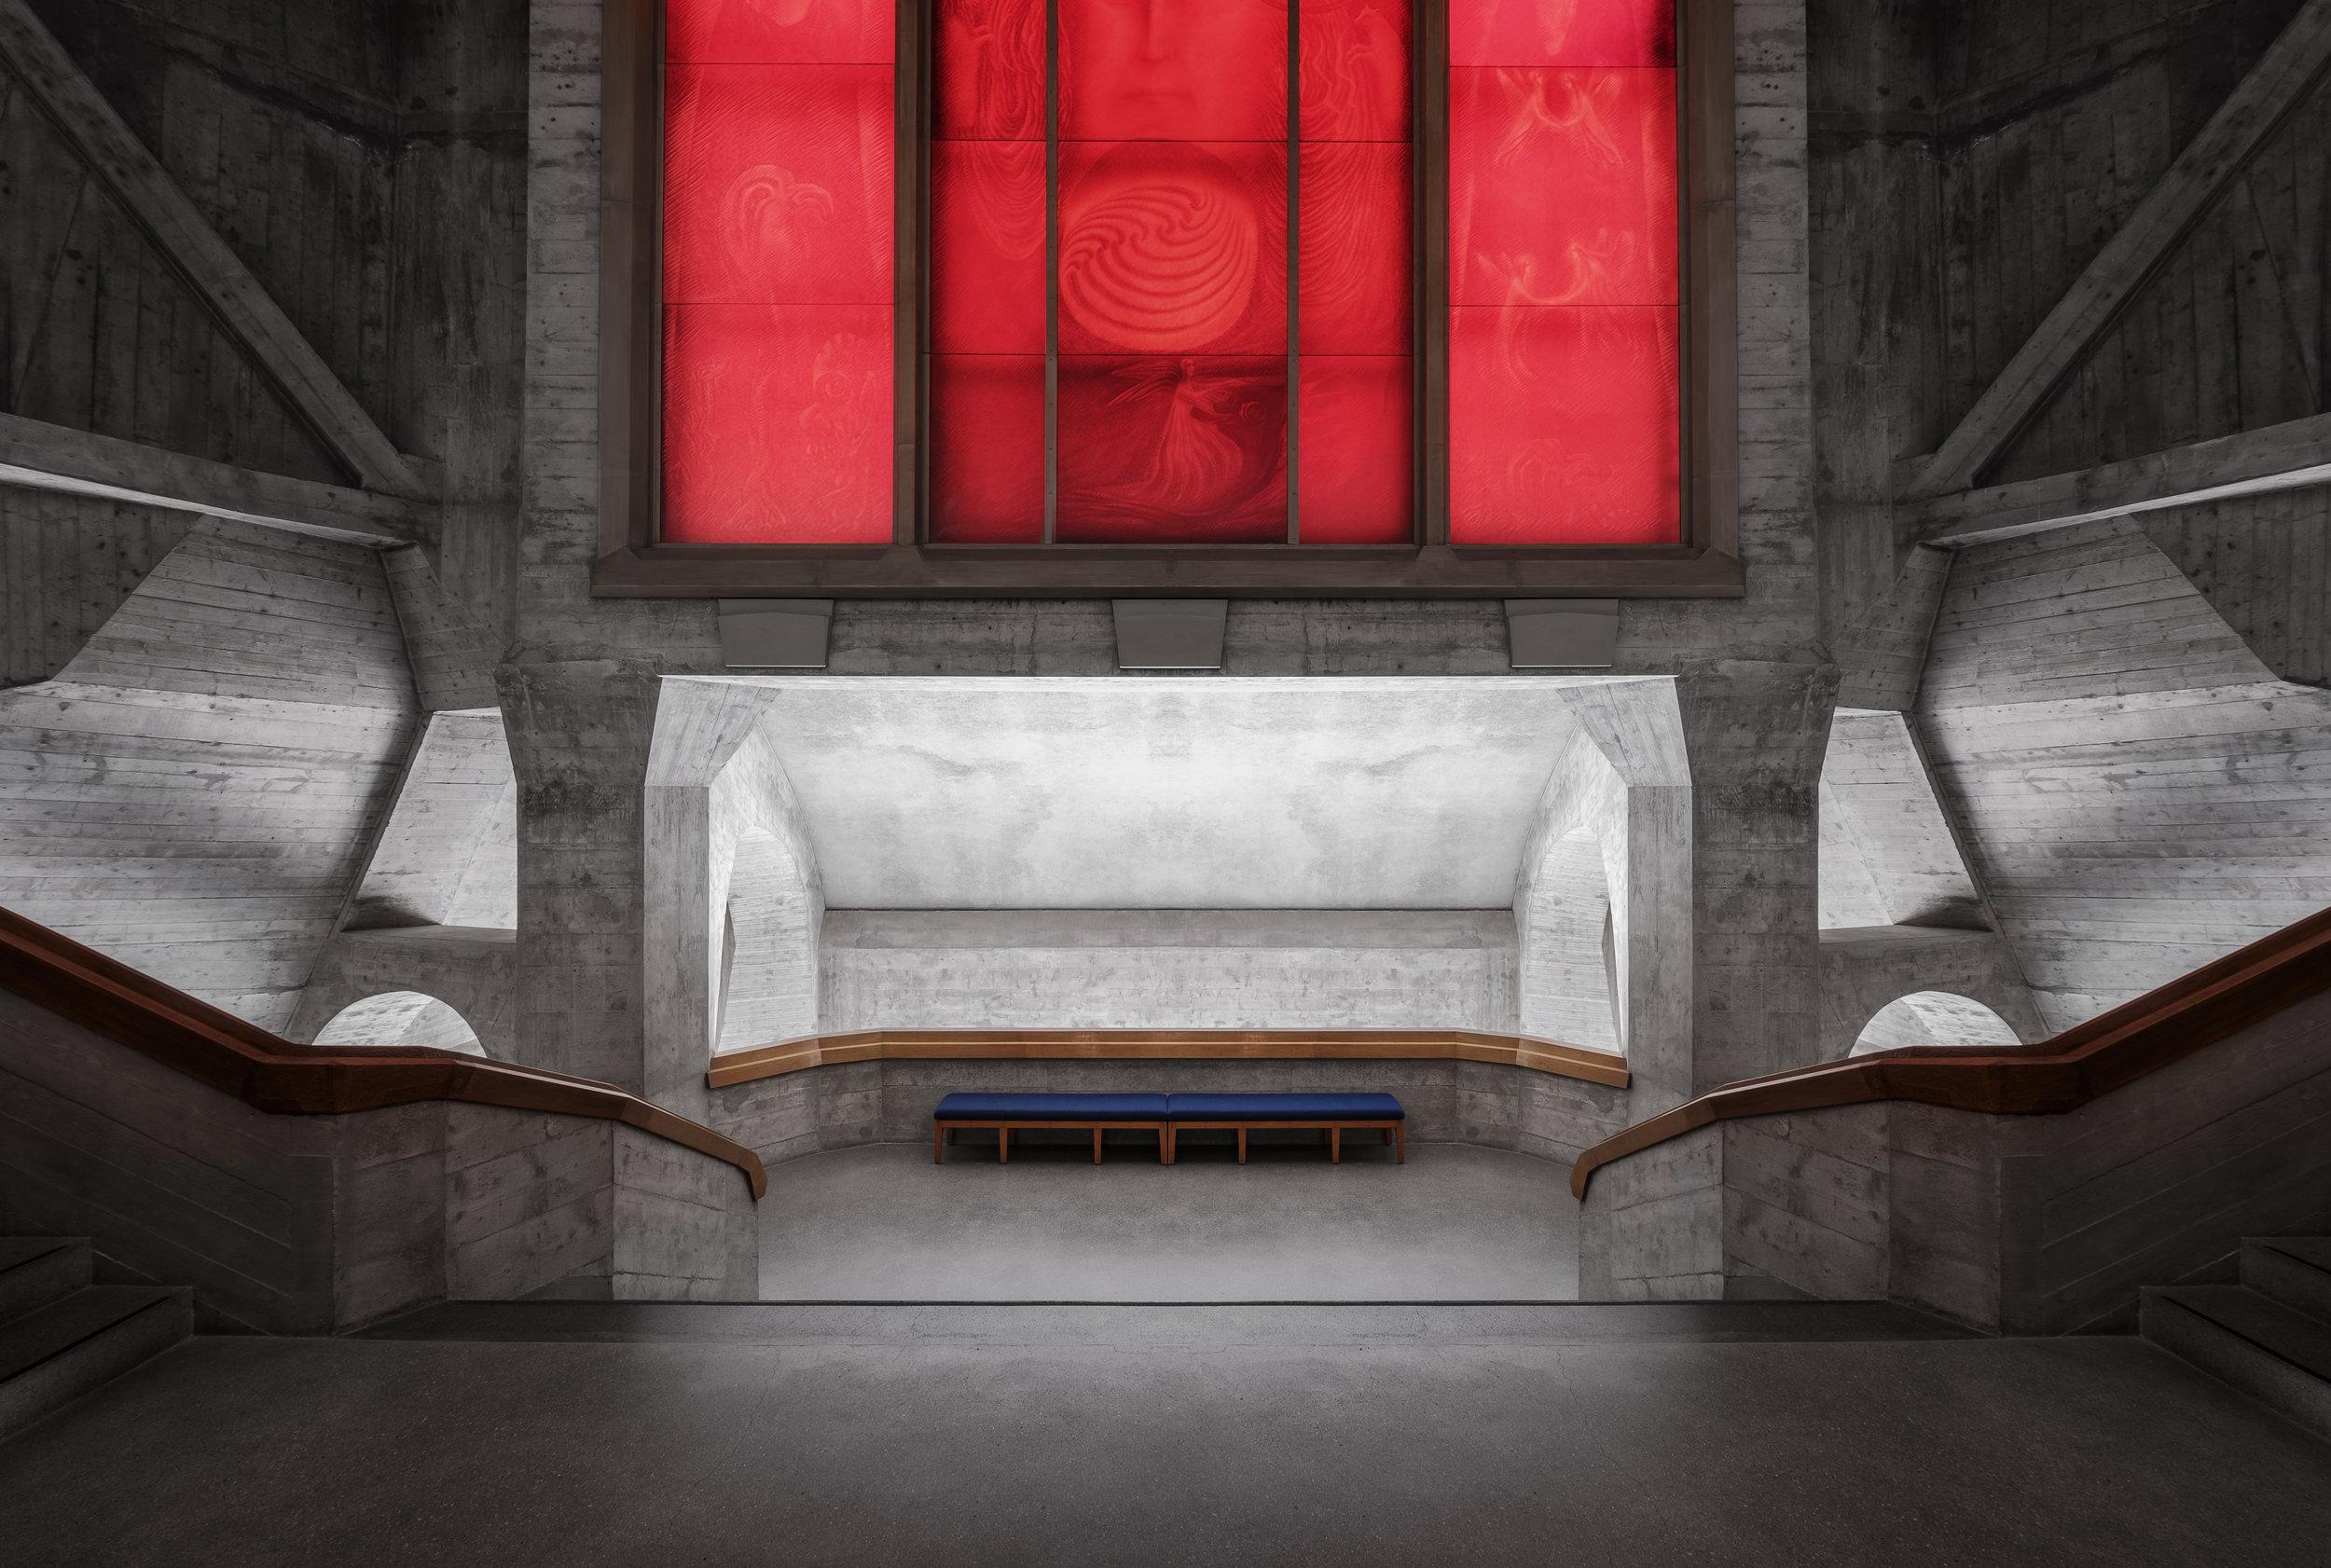 Goetheanum_2019_MTD_464-HDR-Edit.jpg